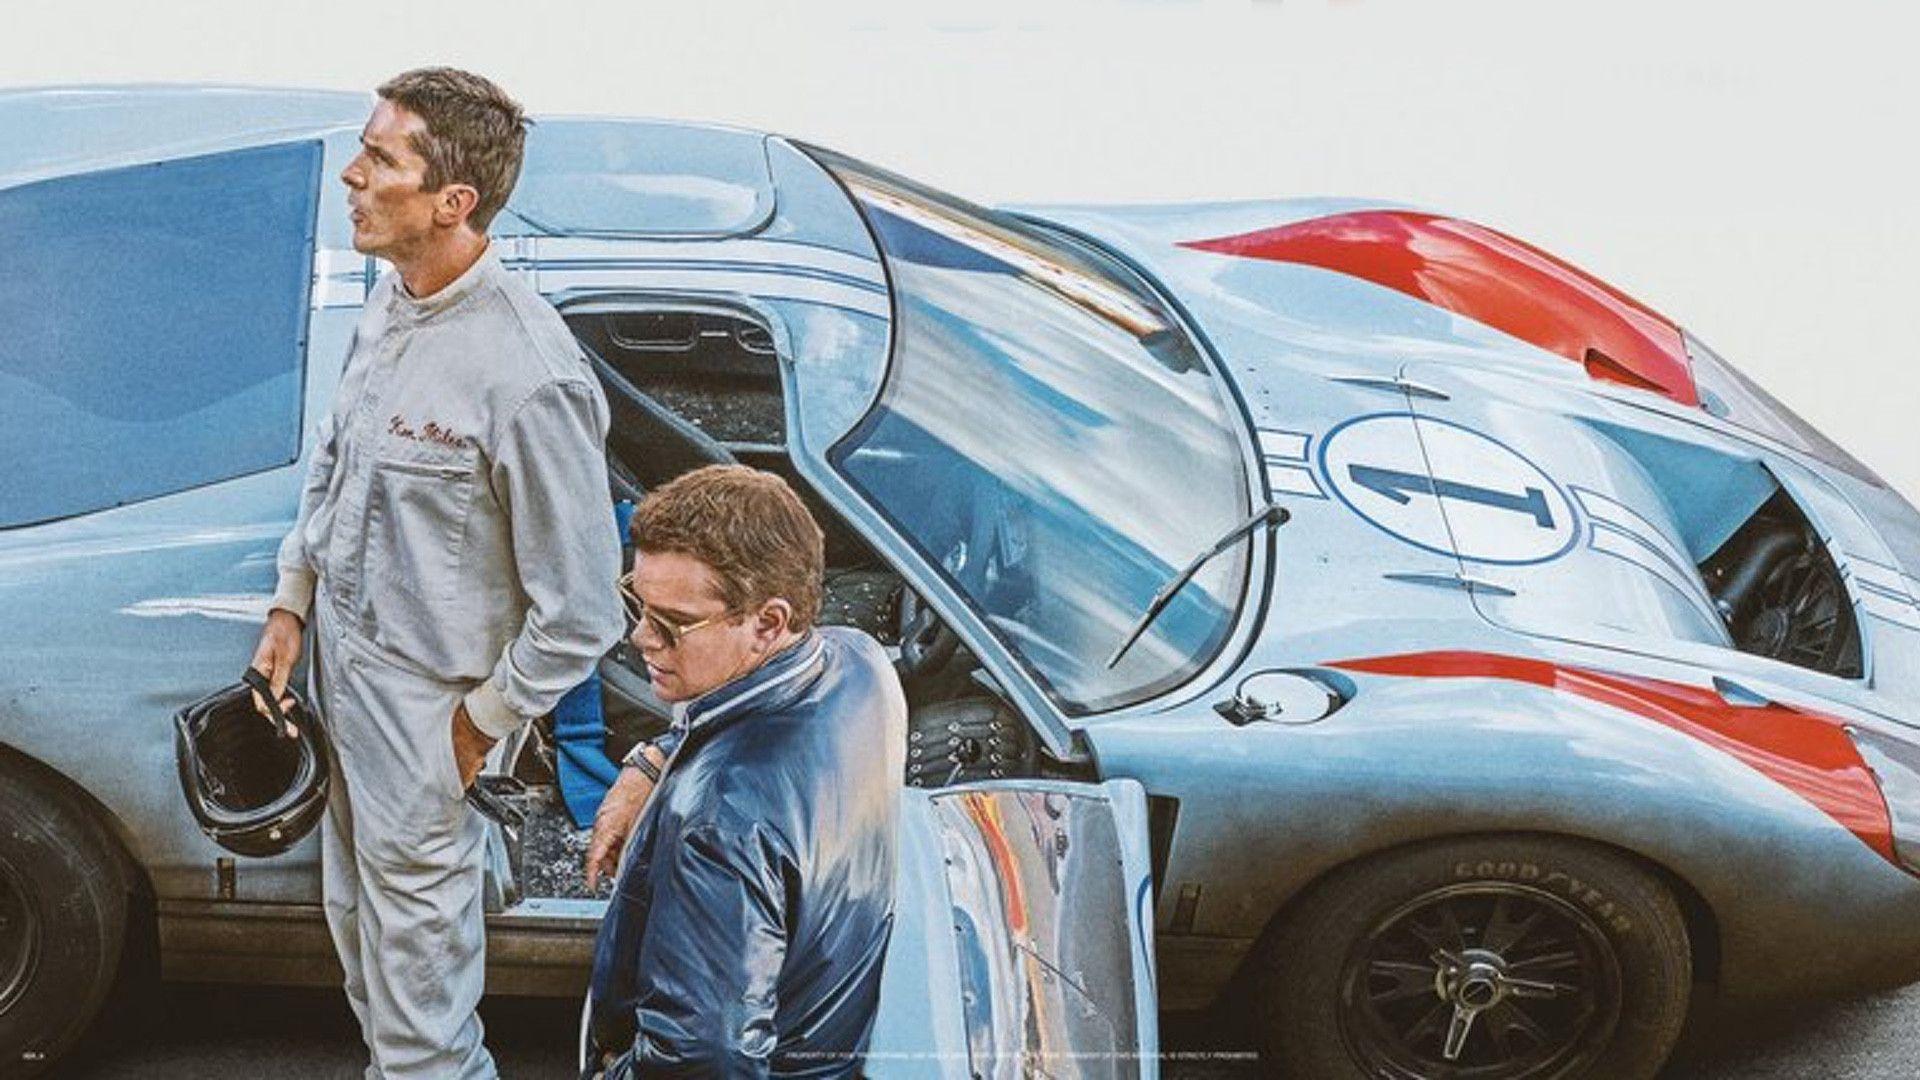 Film Ford v. Ferrari: Christian Bale e Matt Damon, il trailer - MotorBox